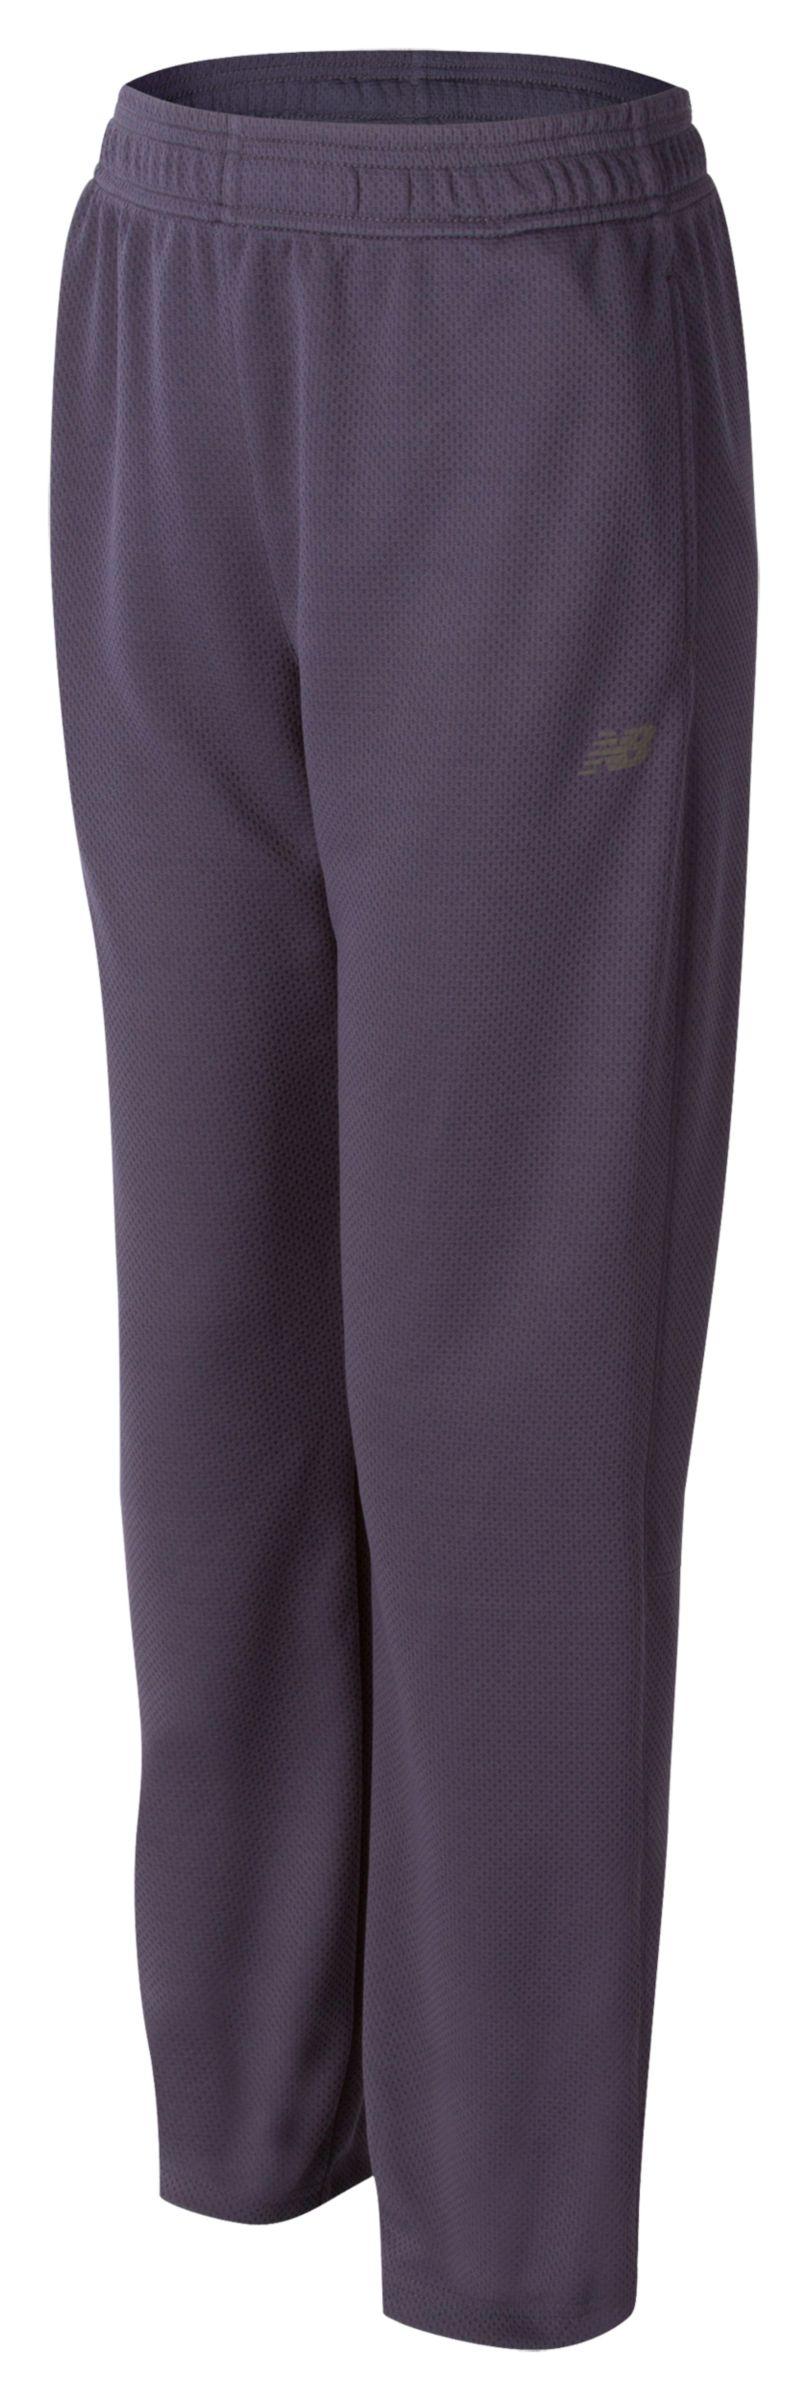 New Balance Boys Athletic Pant Grey